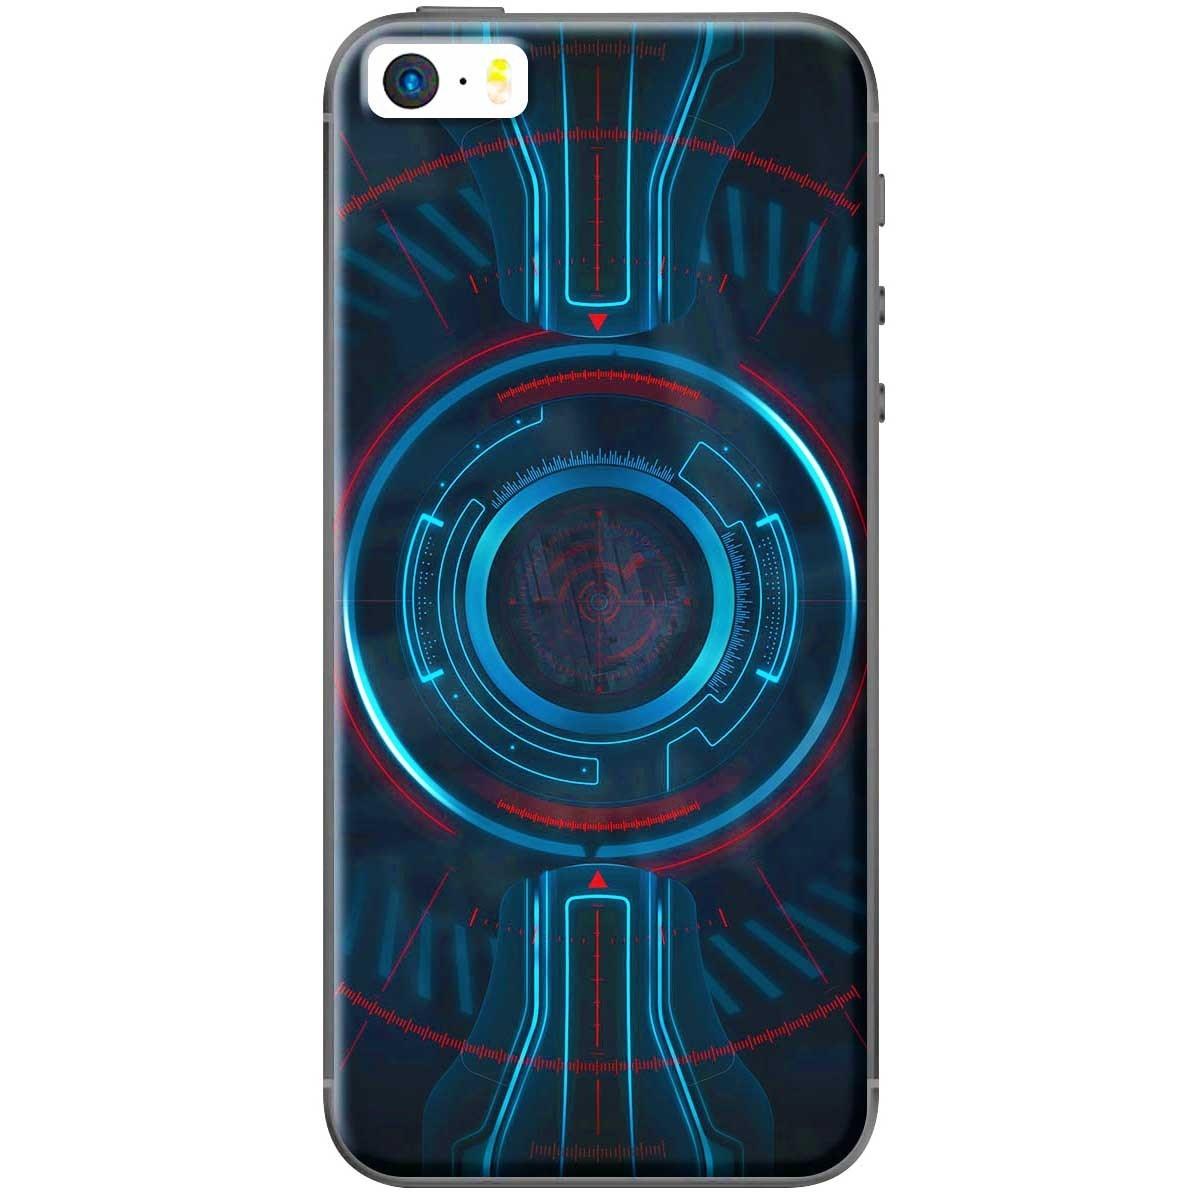 Ốp lưng iPhone 5, iPhone 5S Vòng tròn xanh